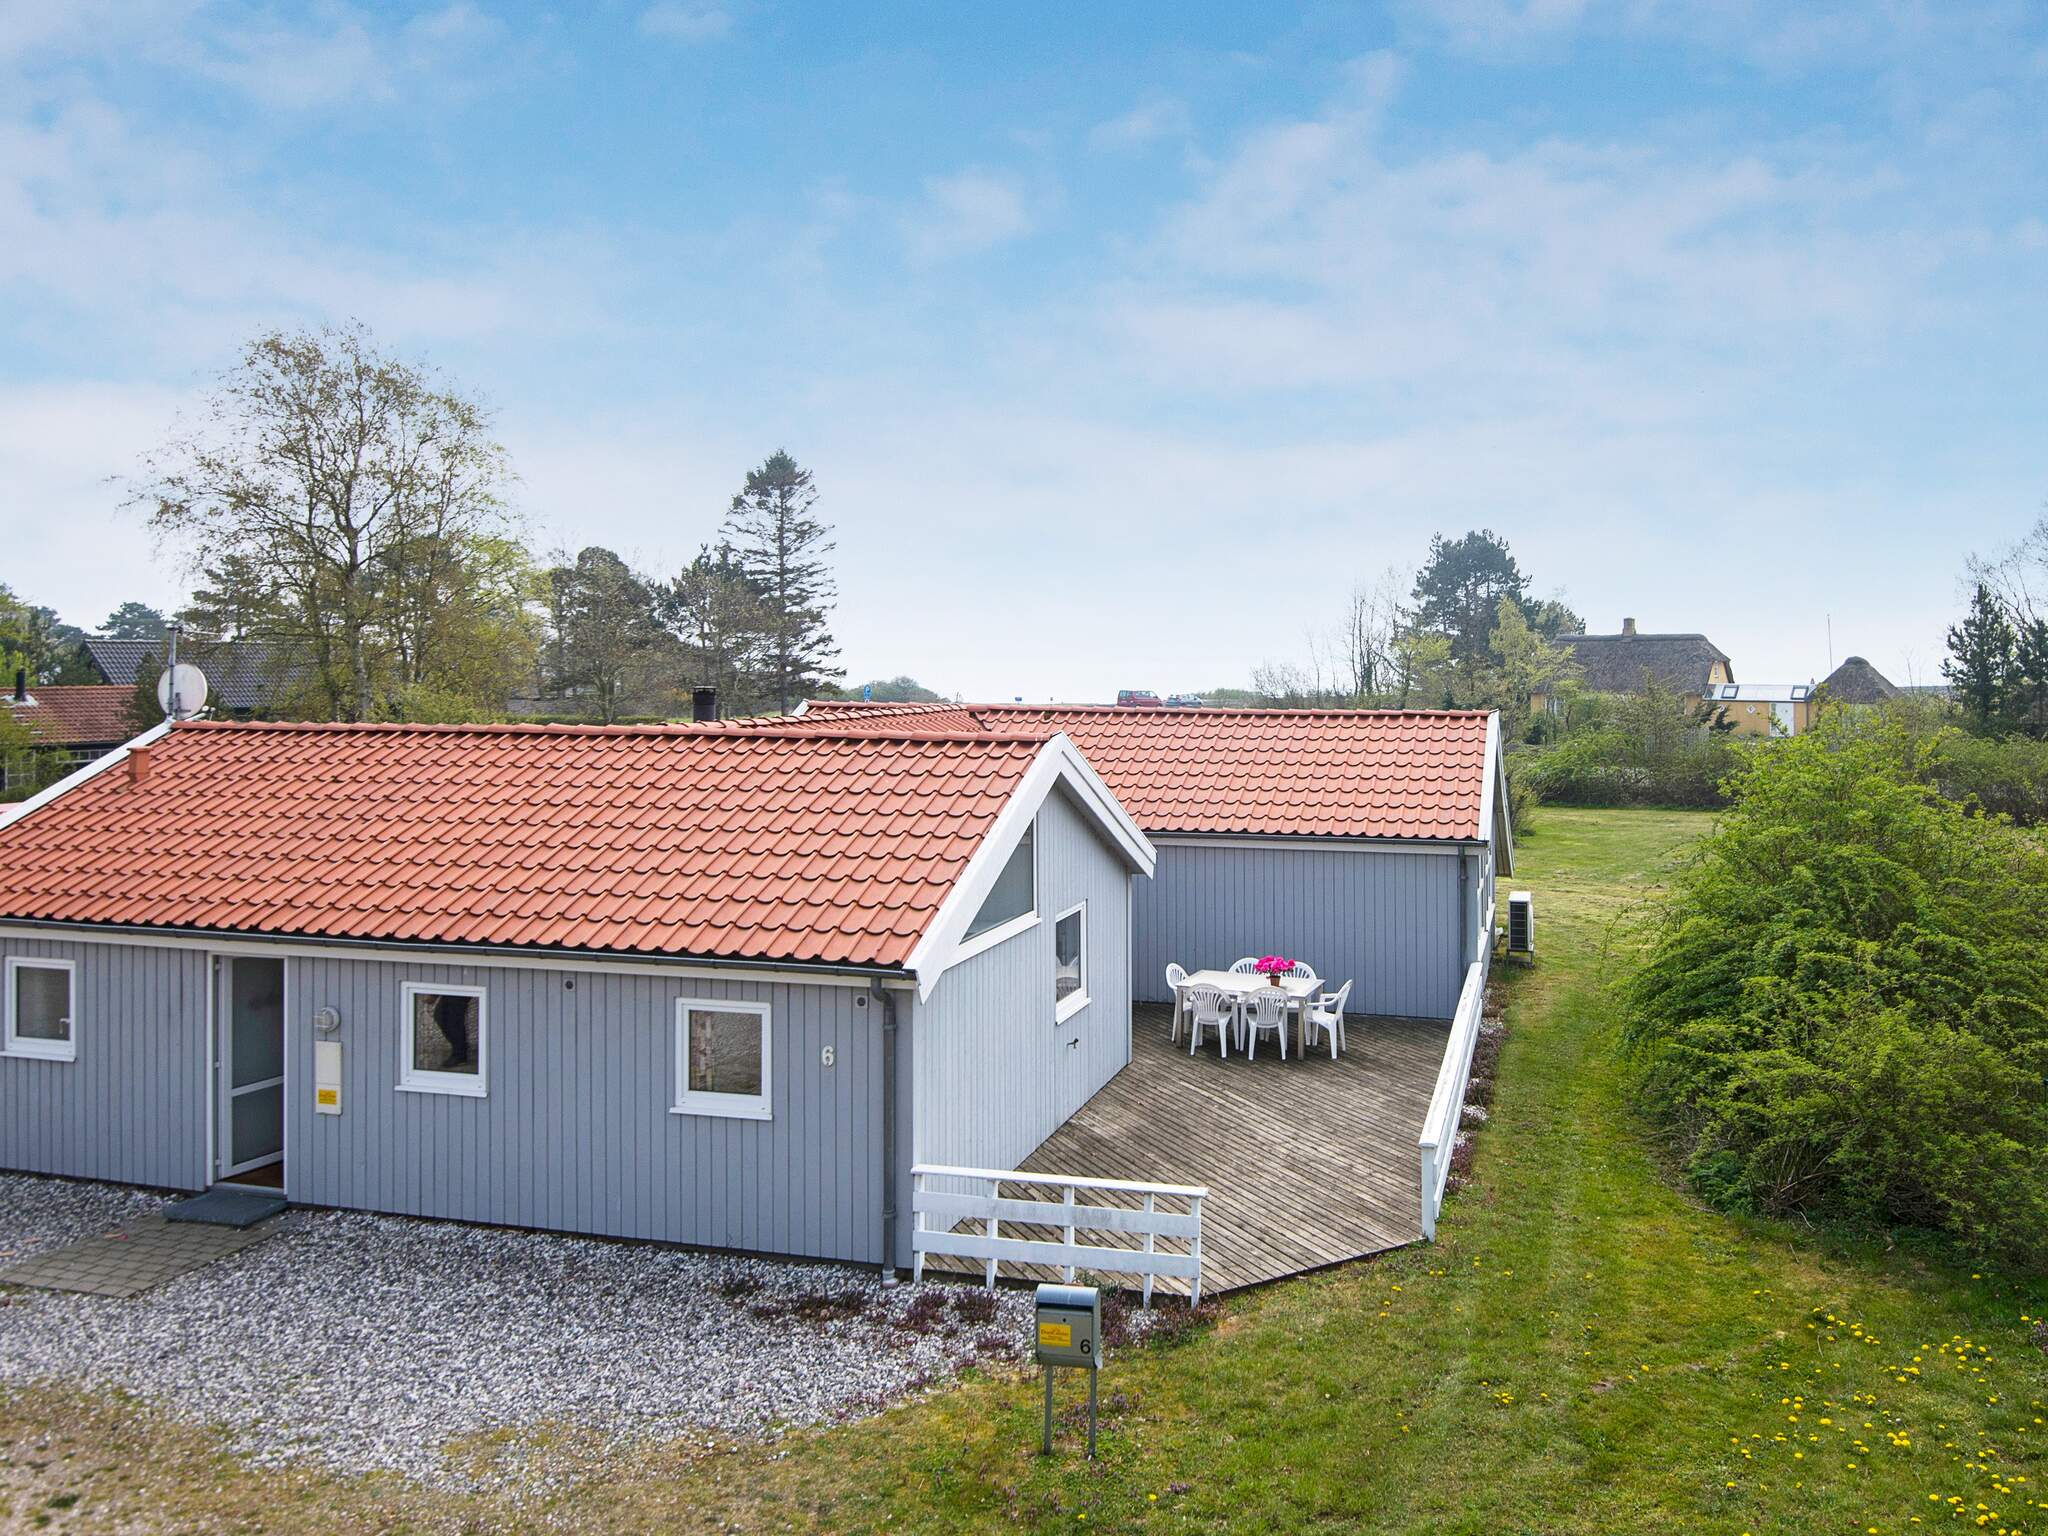 Ferienhaus Lyngsbæk Strand (493391), Ebeltoft, , Ostjütland, Dänemark, Bild 20